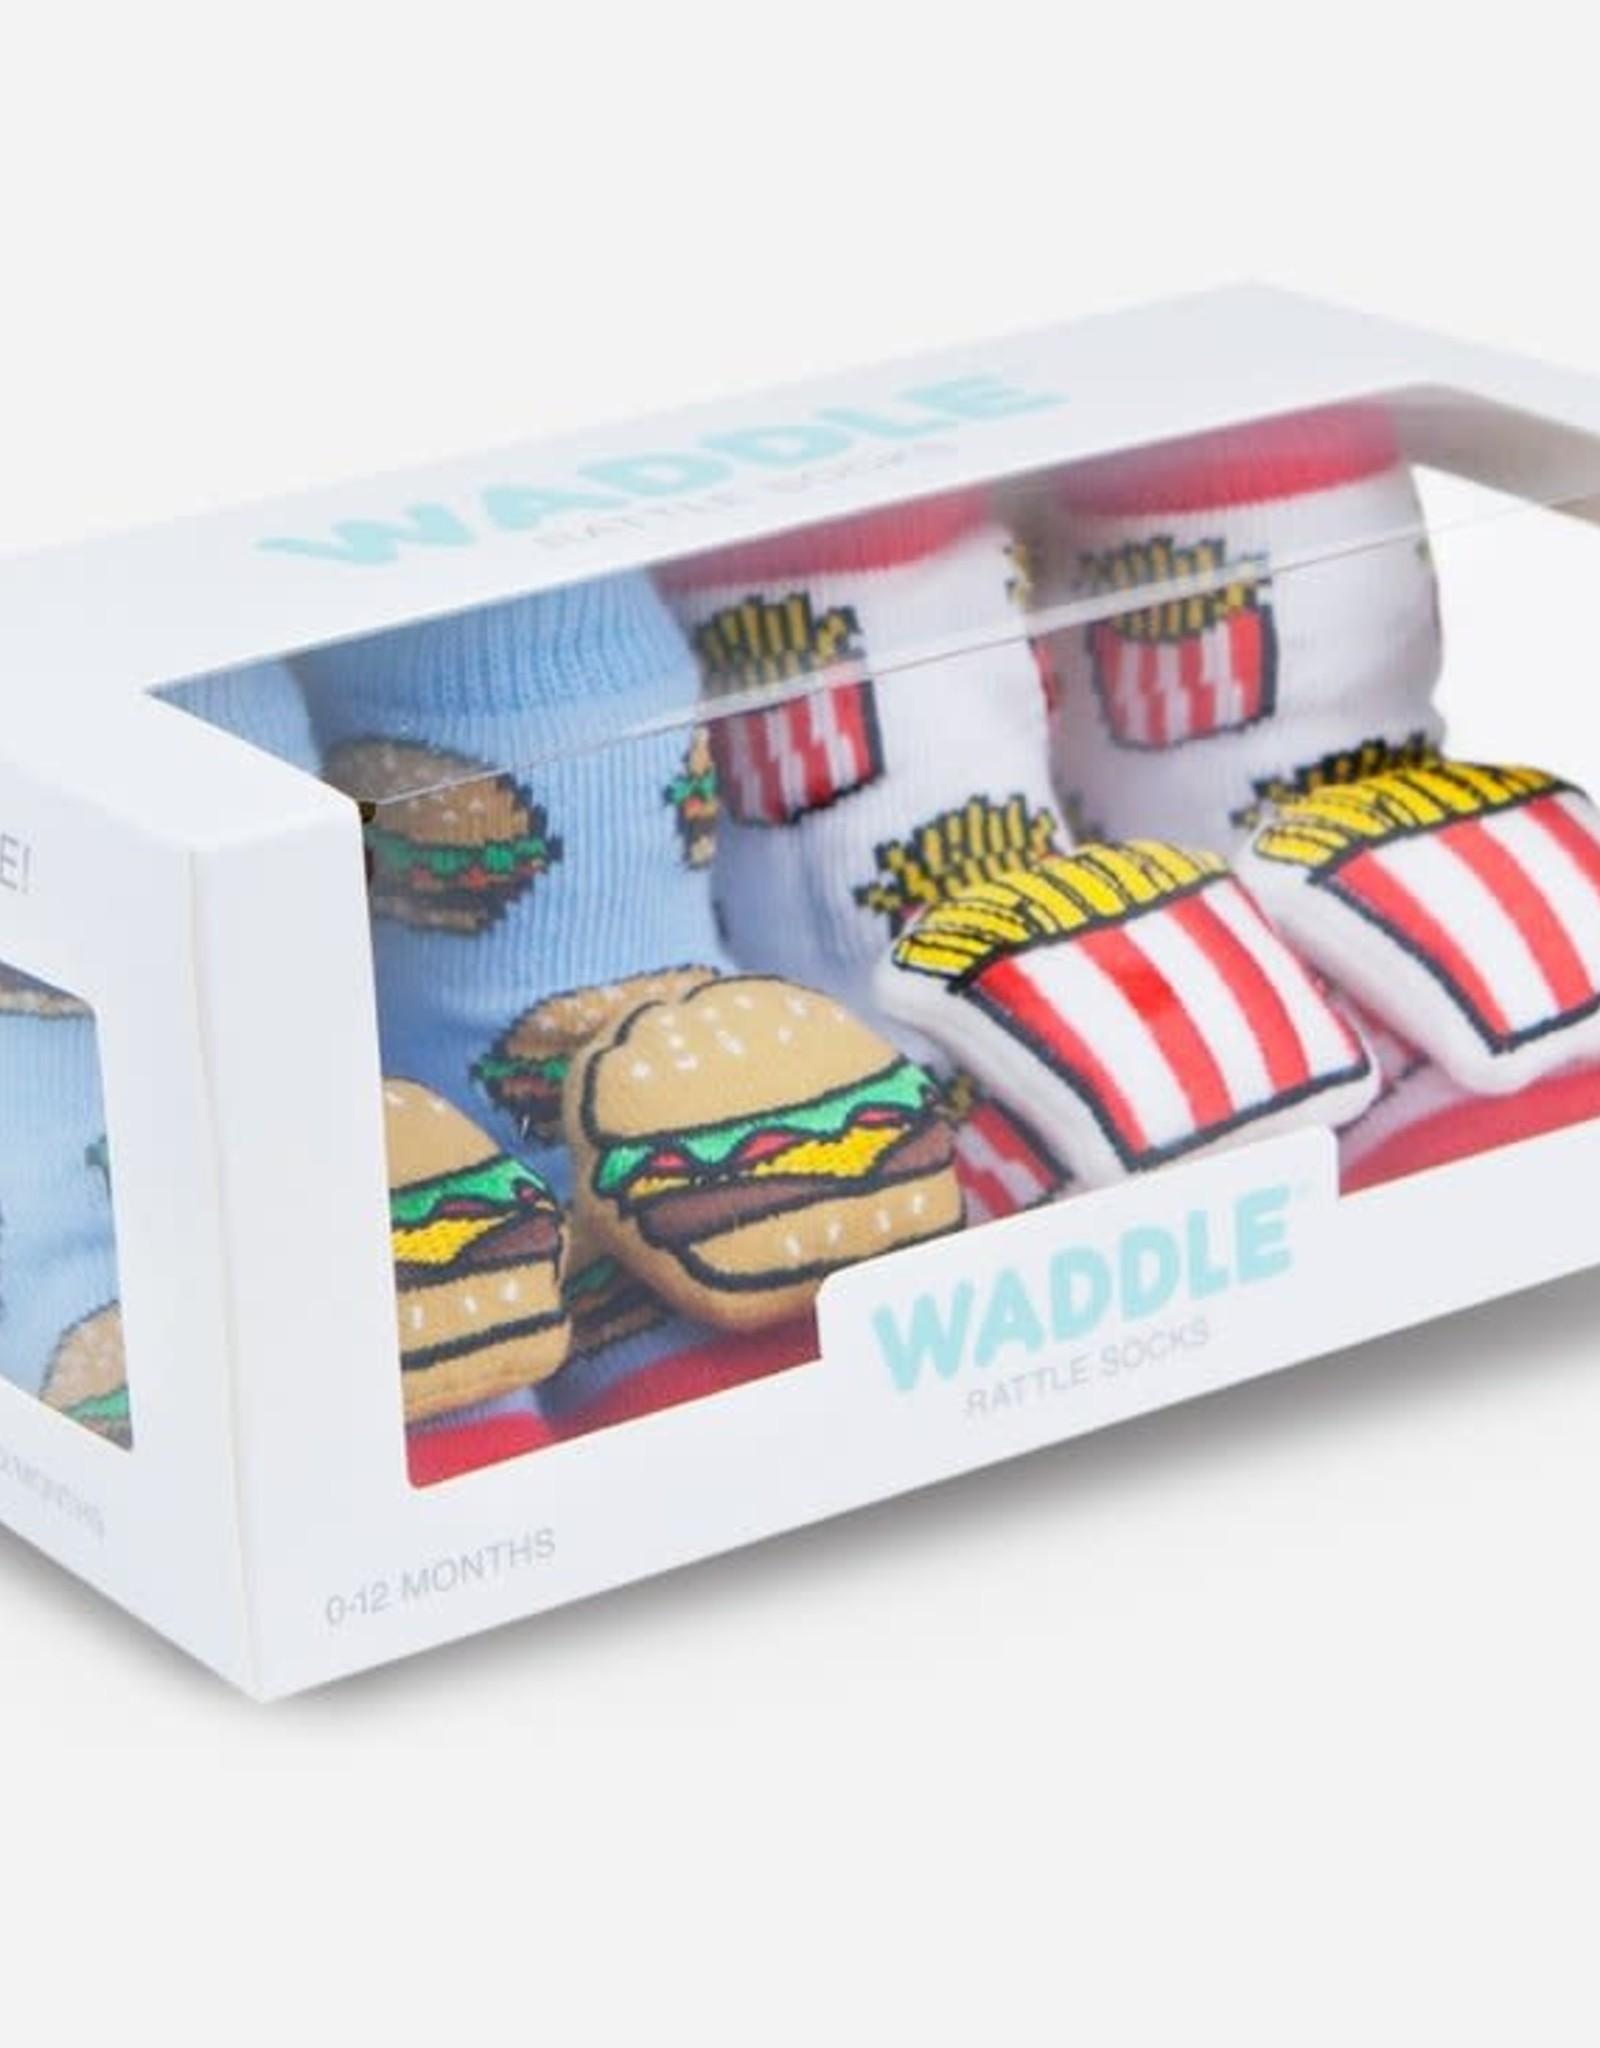 Waddle Burger n Fries Rattle Socks